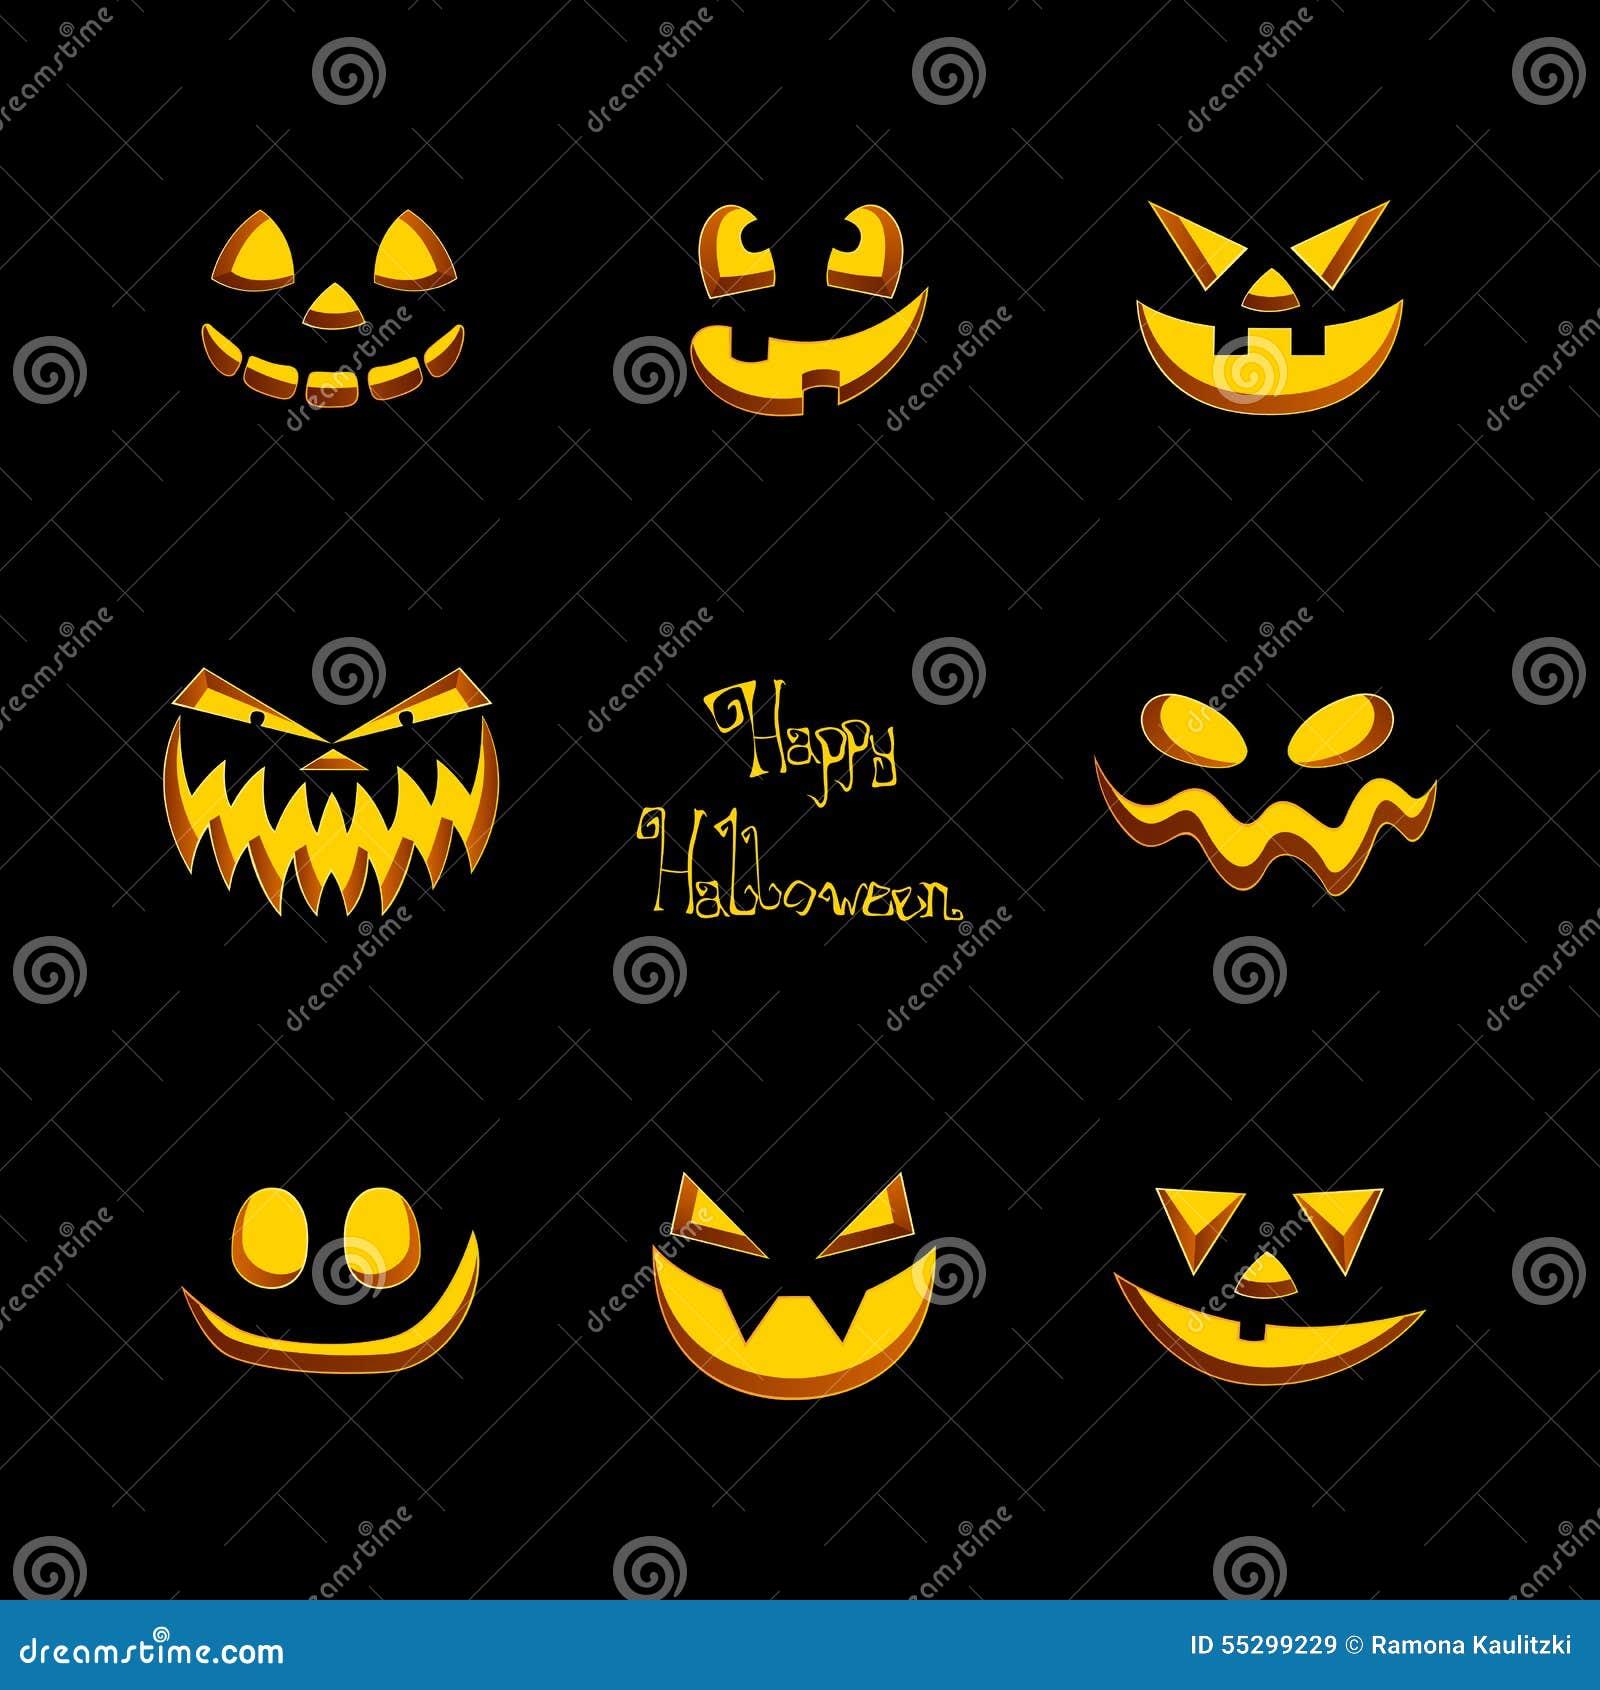 furchtsame halloween k rbis gesichter stock abbildung bild 55299229. Black Bedroom Furniture Sets. Home Design Ideas